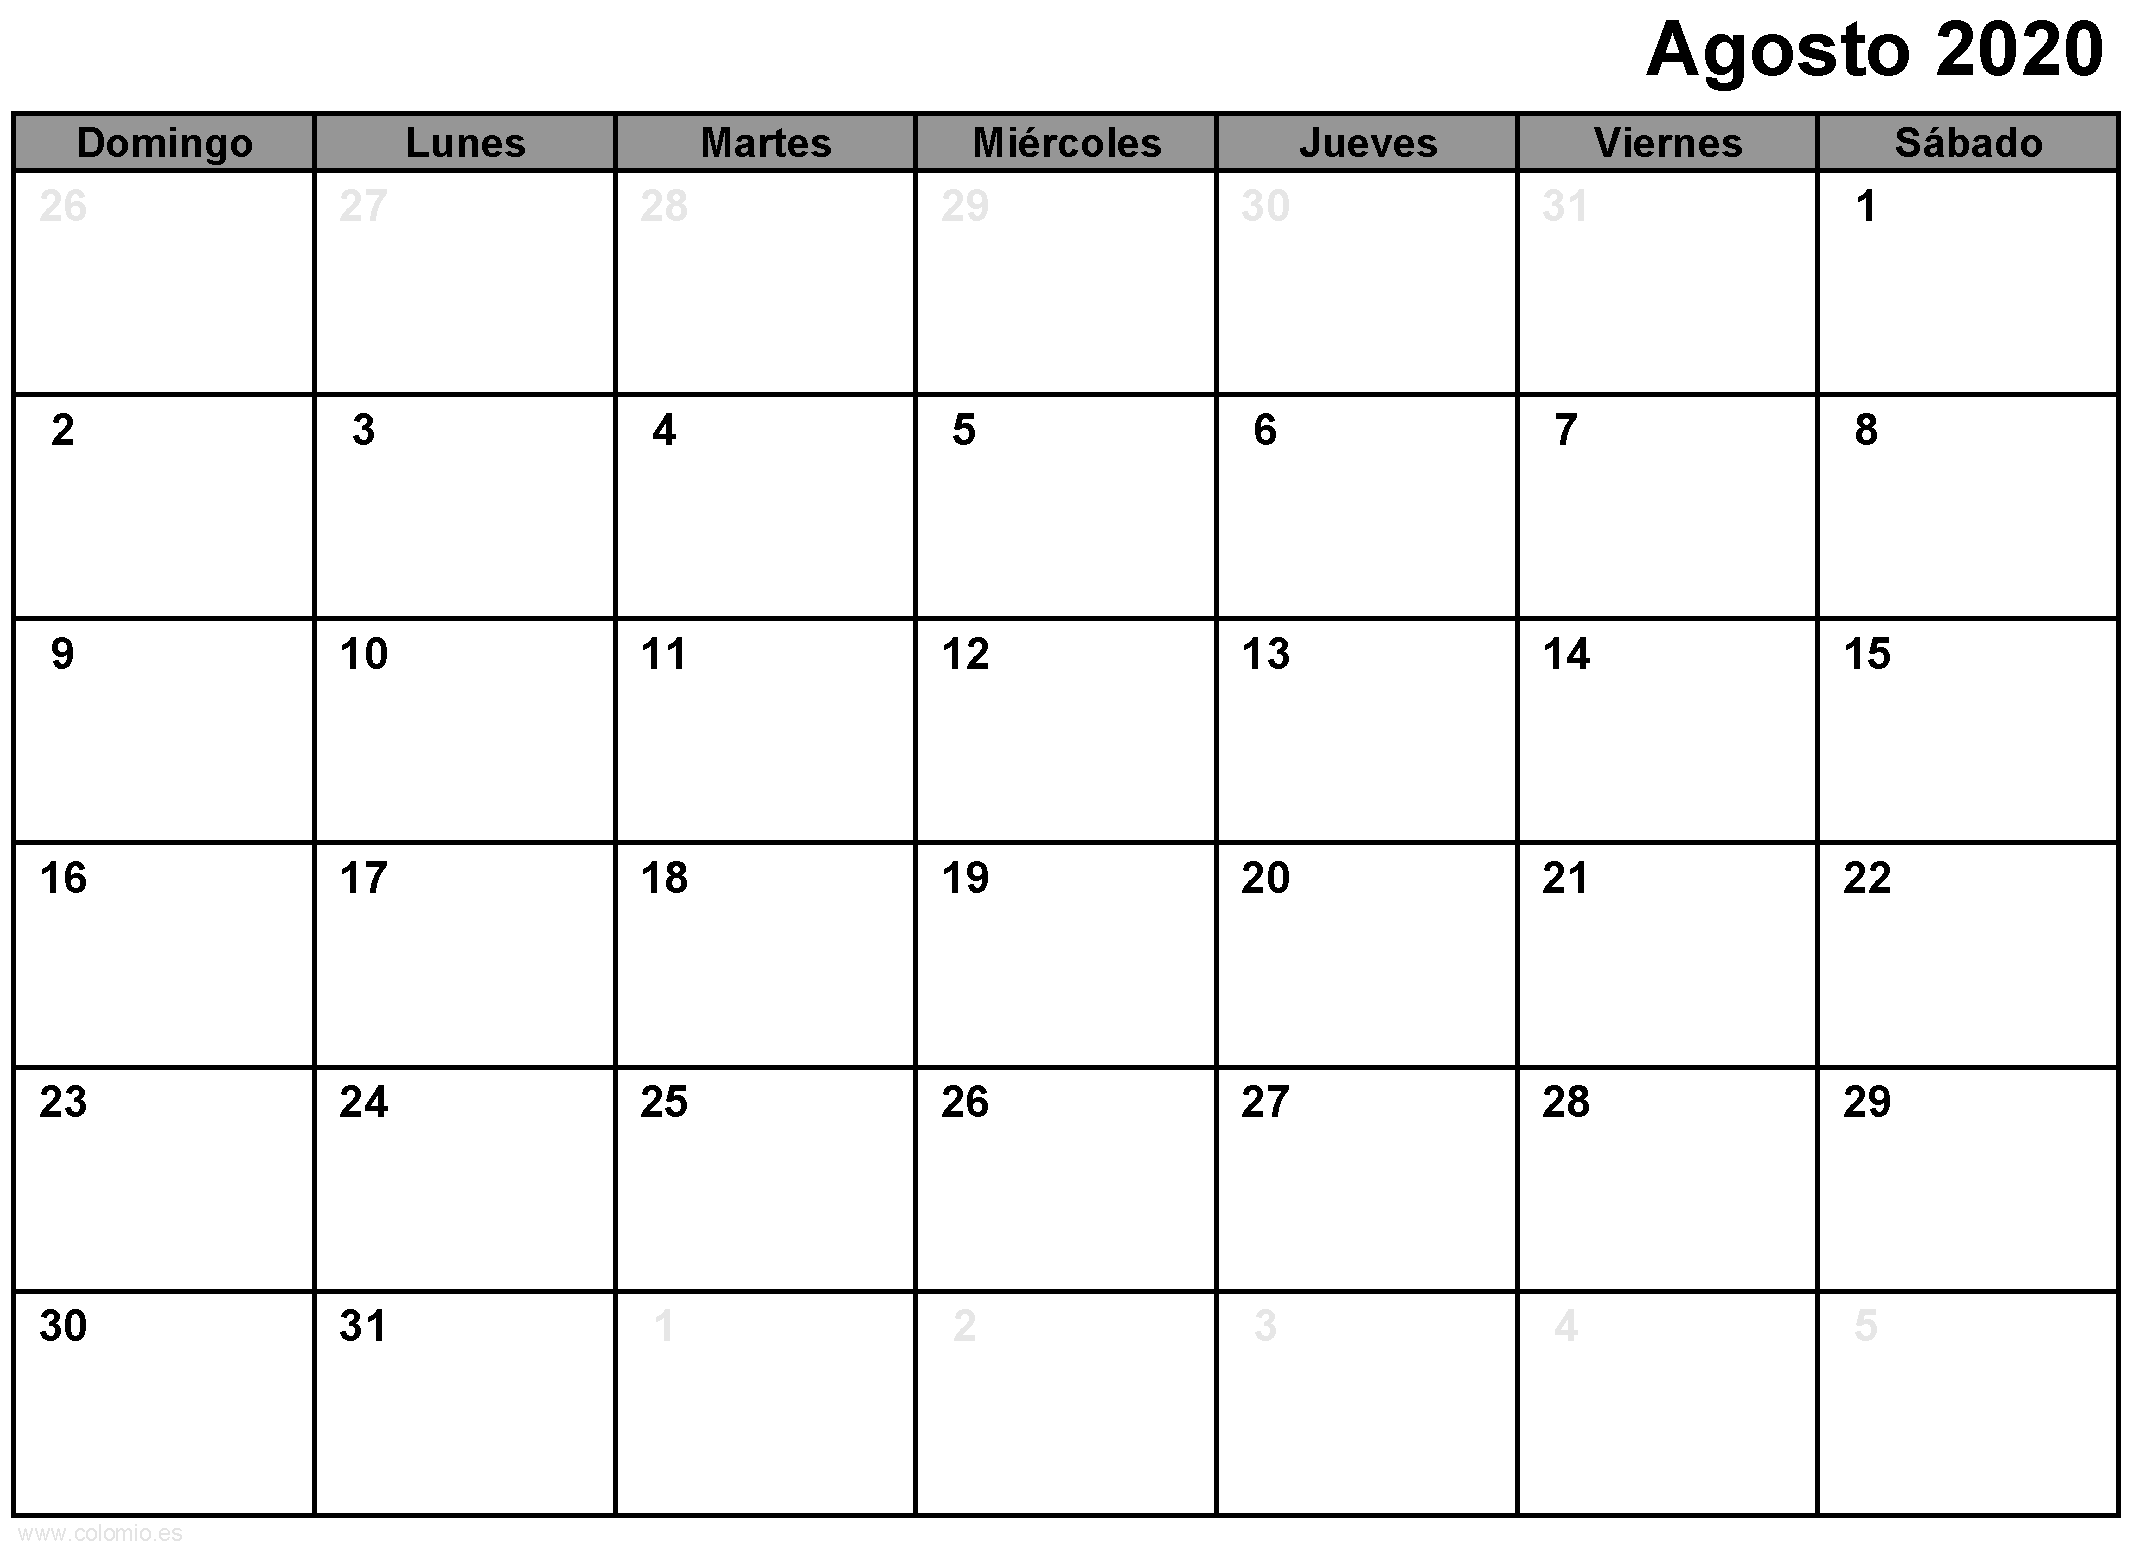 Agosto 2020 Calendar para imprimir